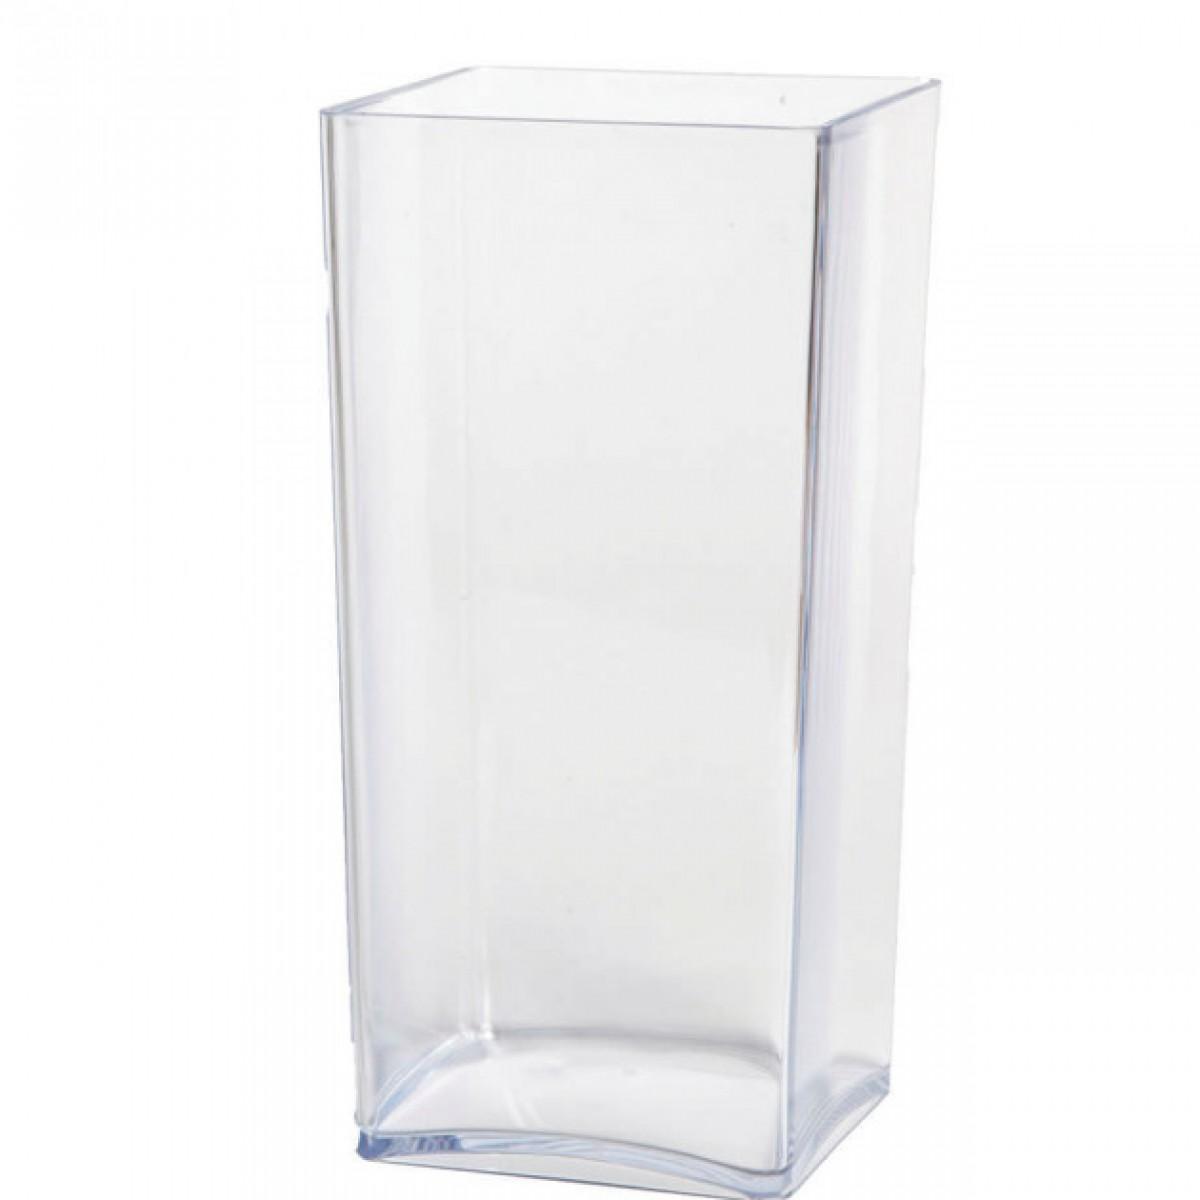 Cube Clear 12x12x25cm Acrylic Vase - 1 No